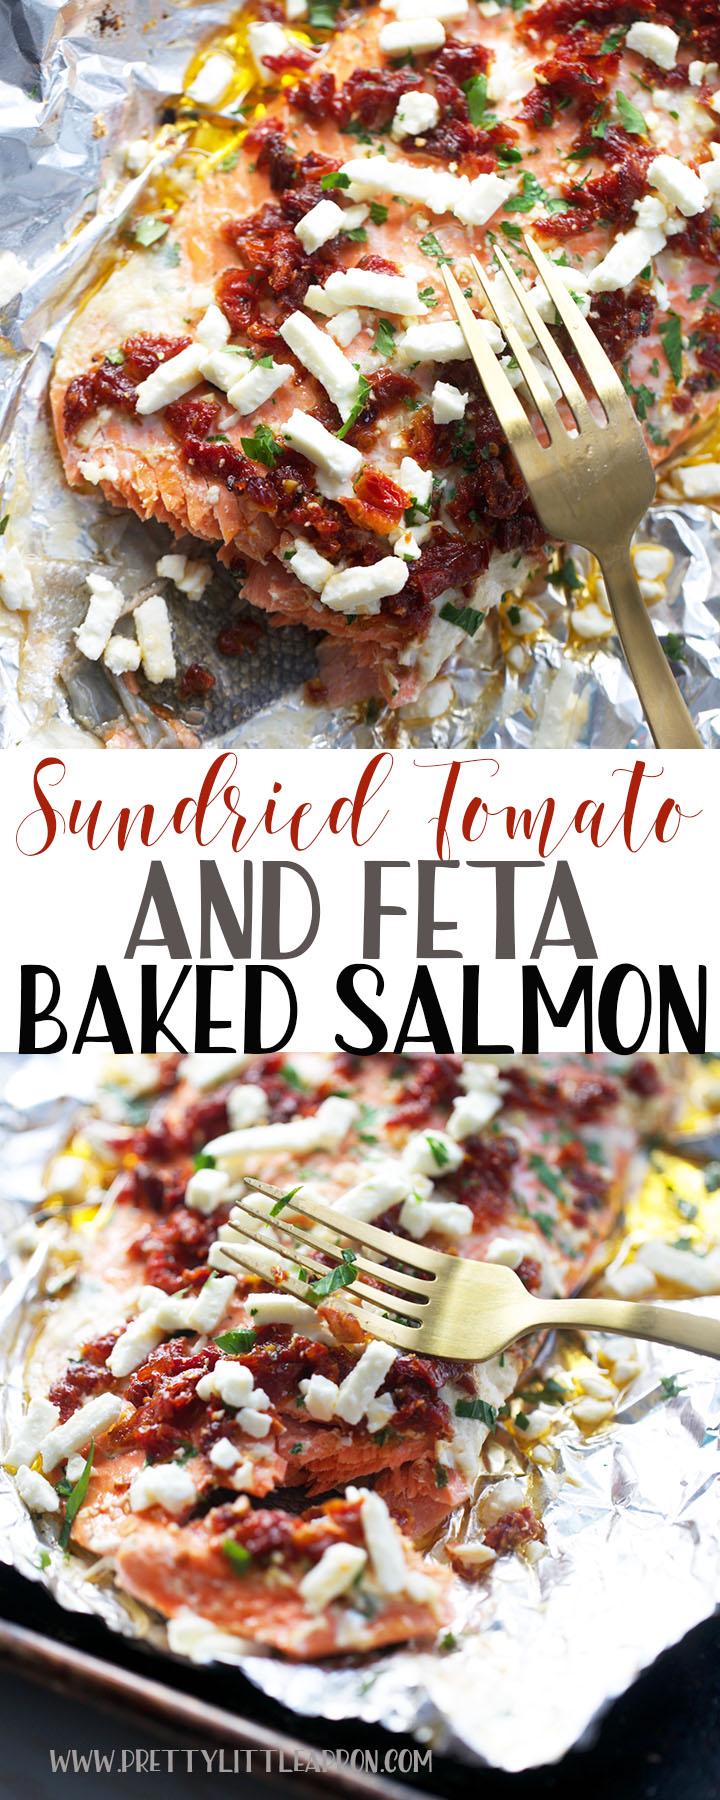 Sundried Tomato Baked Salmon